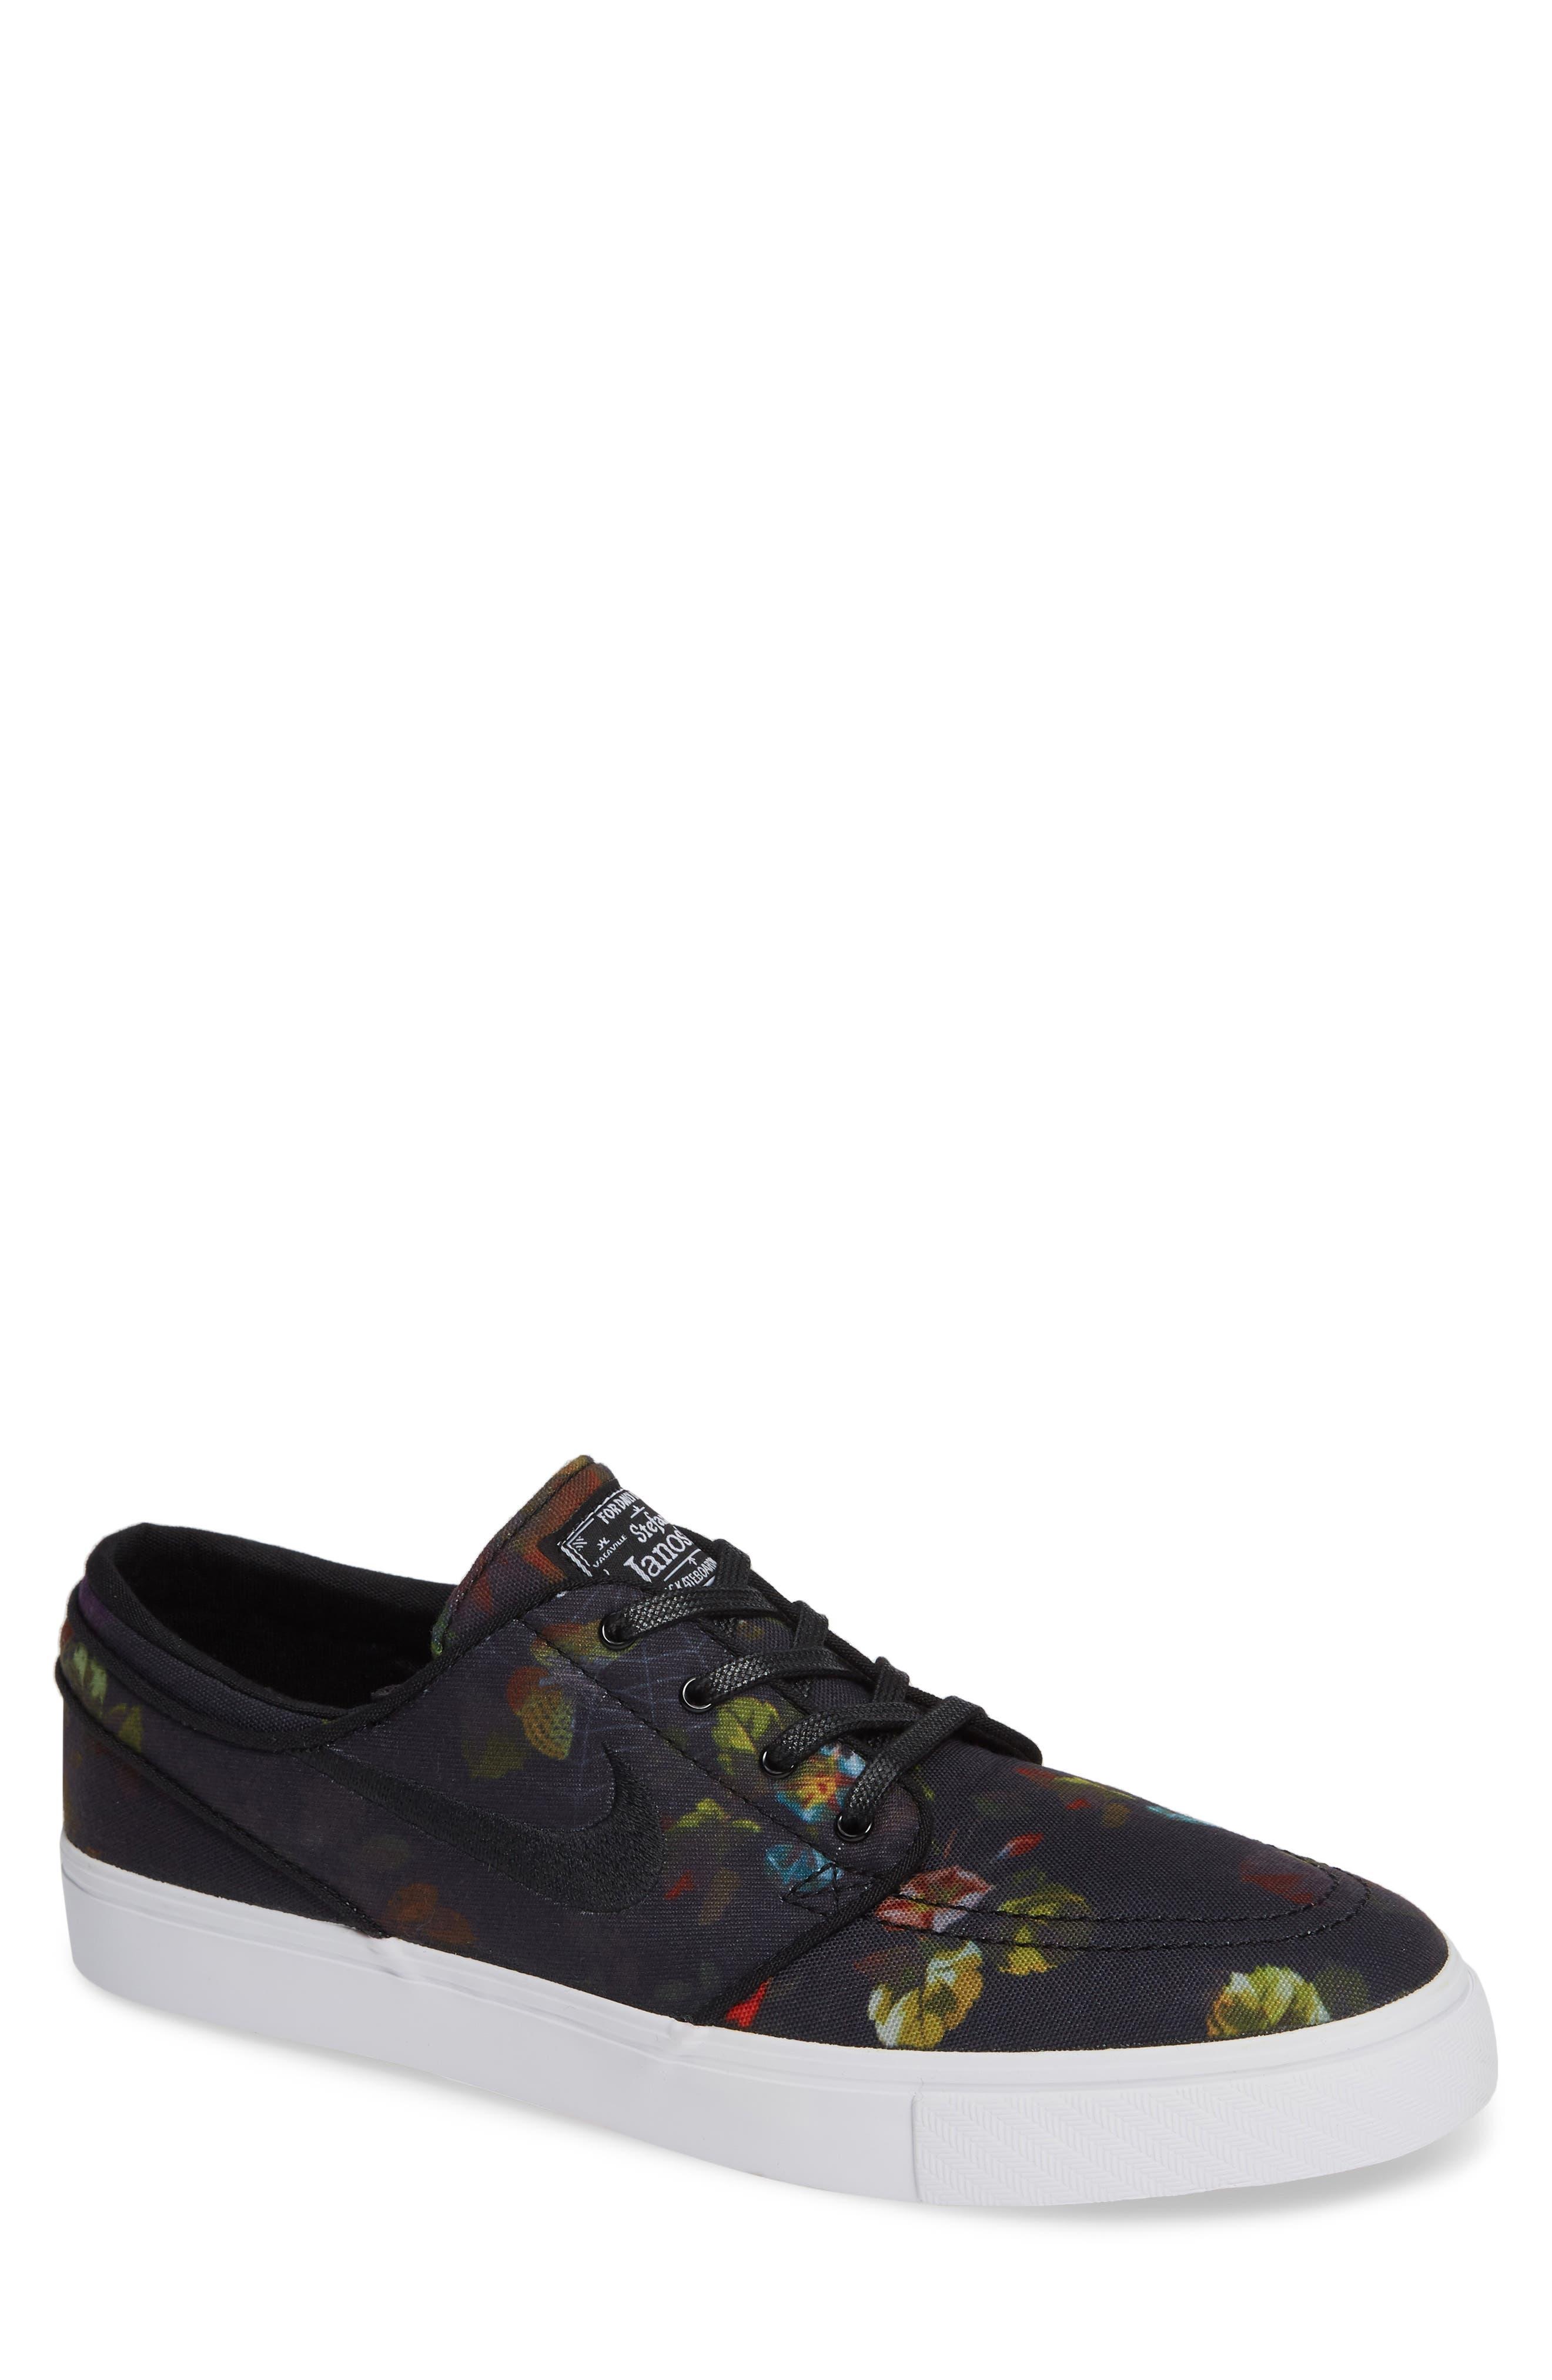 Zoom - Stefan Janoski SB Canvas Skate Shoe,                             Main thumbnail 1, color,